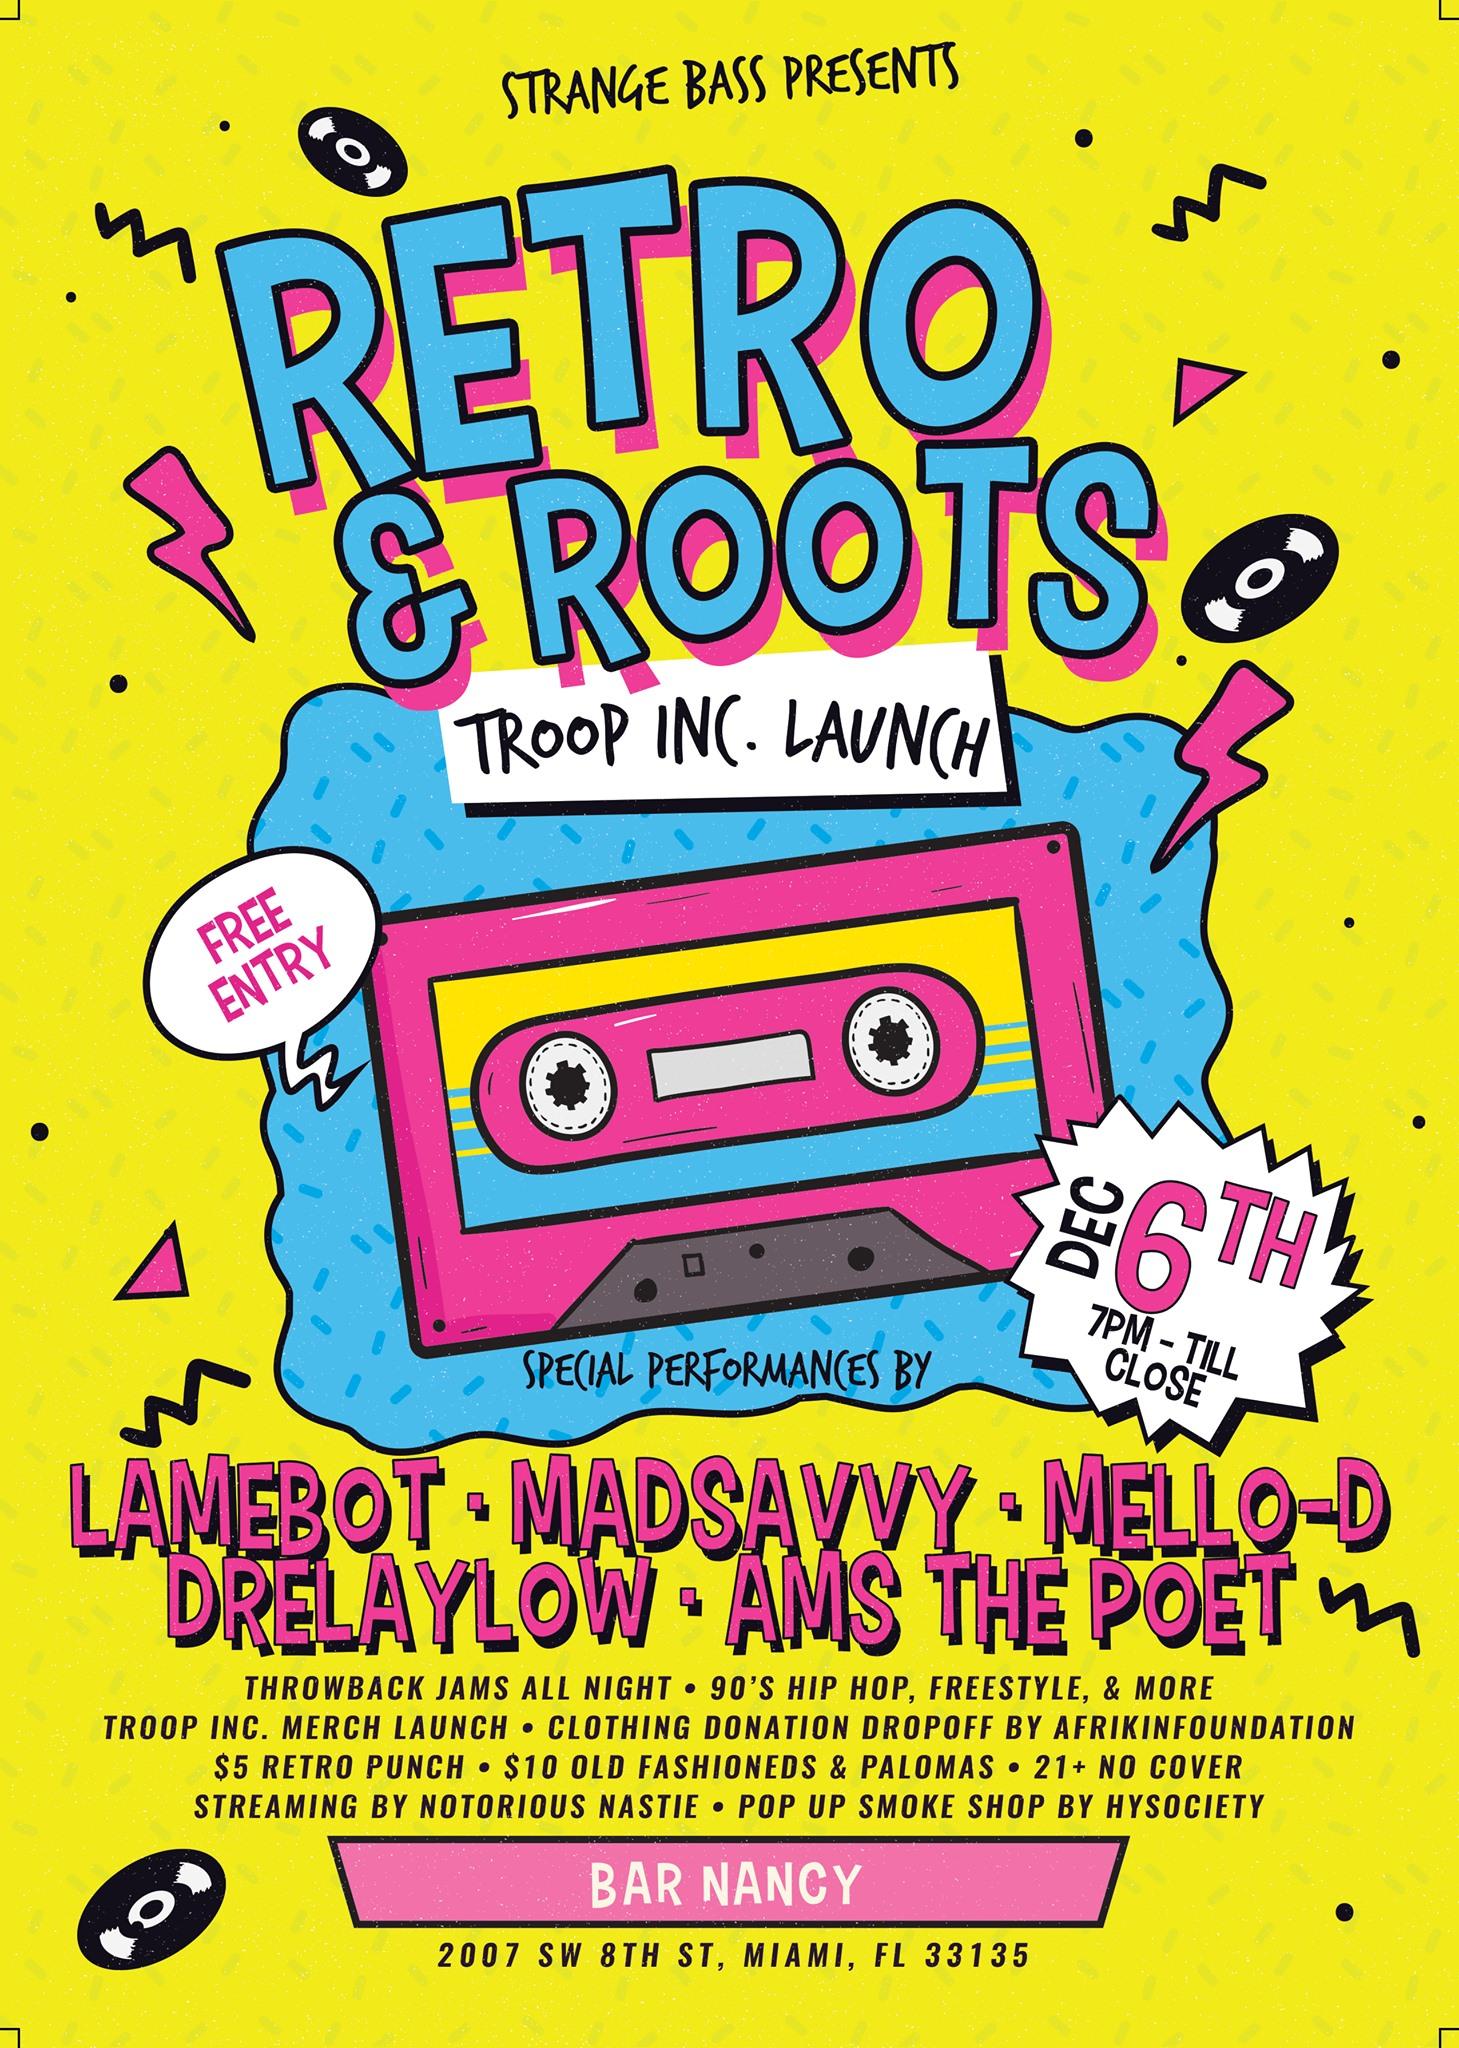 Retro & Roots (Troop Inc. Launch)at Bar Nancy